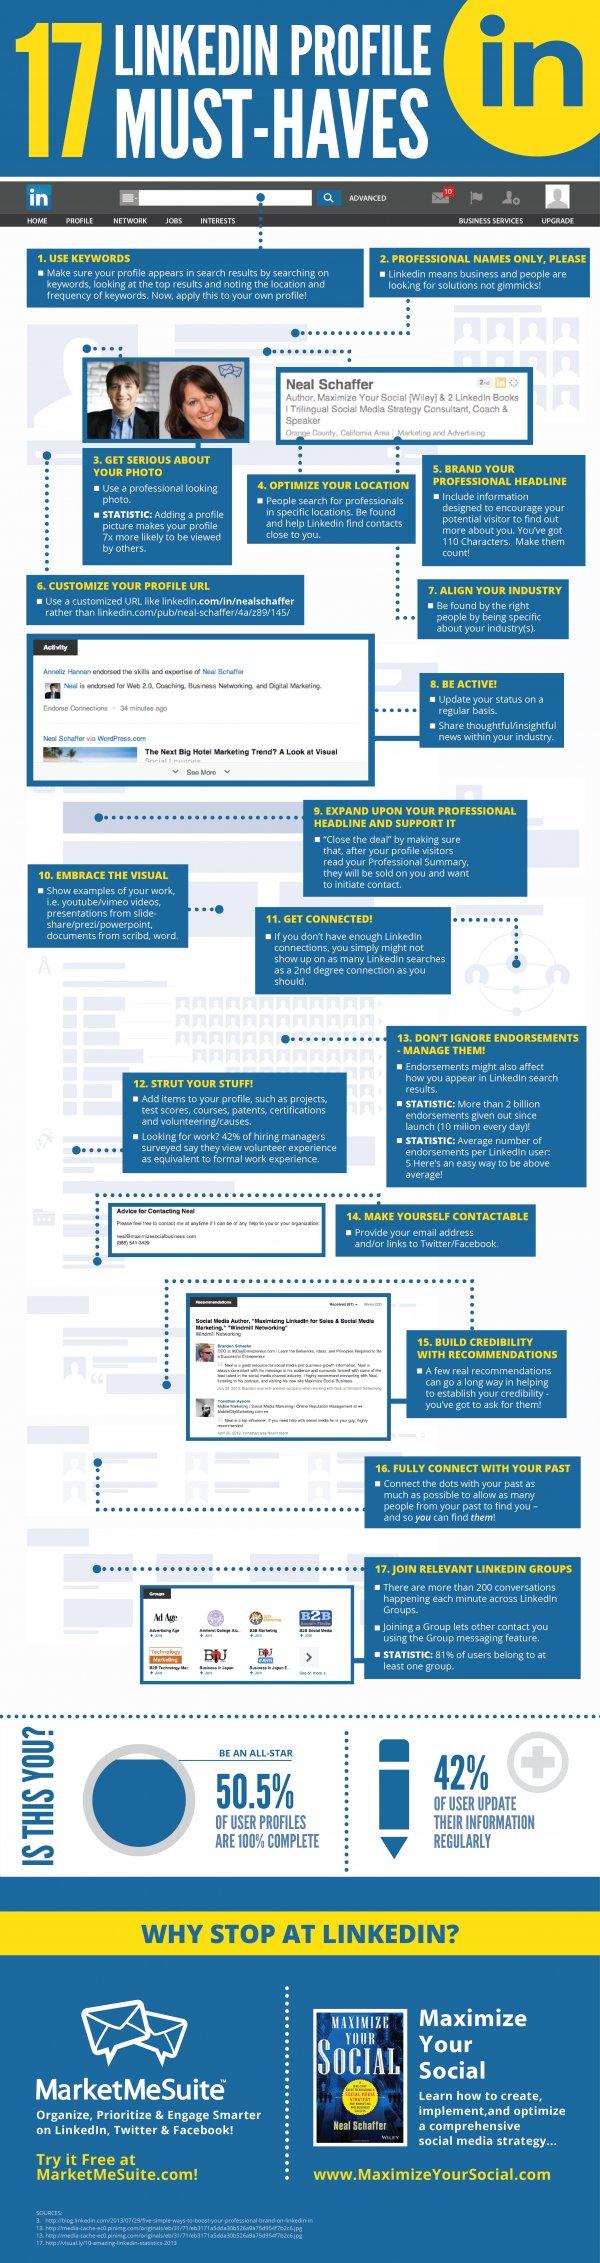 17 consejos para optimizar tu perfil de Linkedin [Infografía]